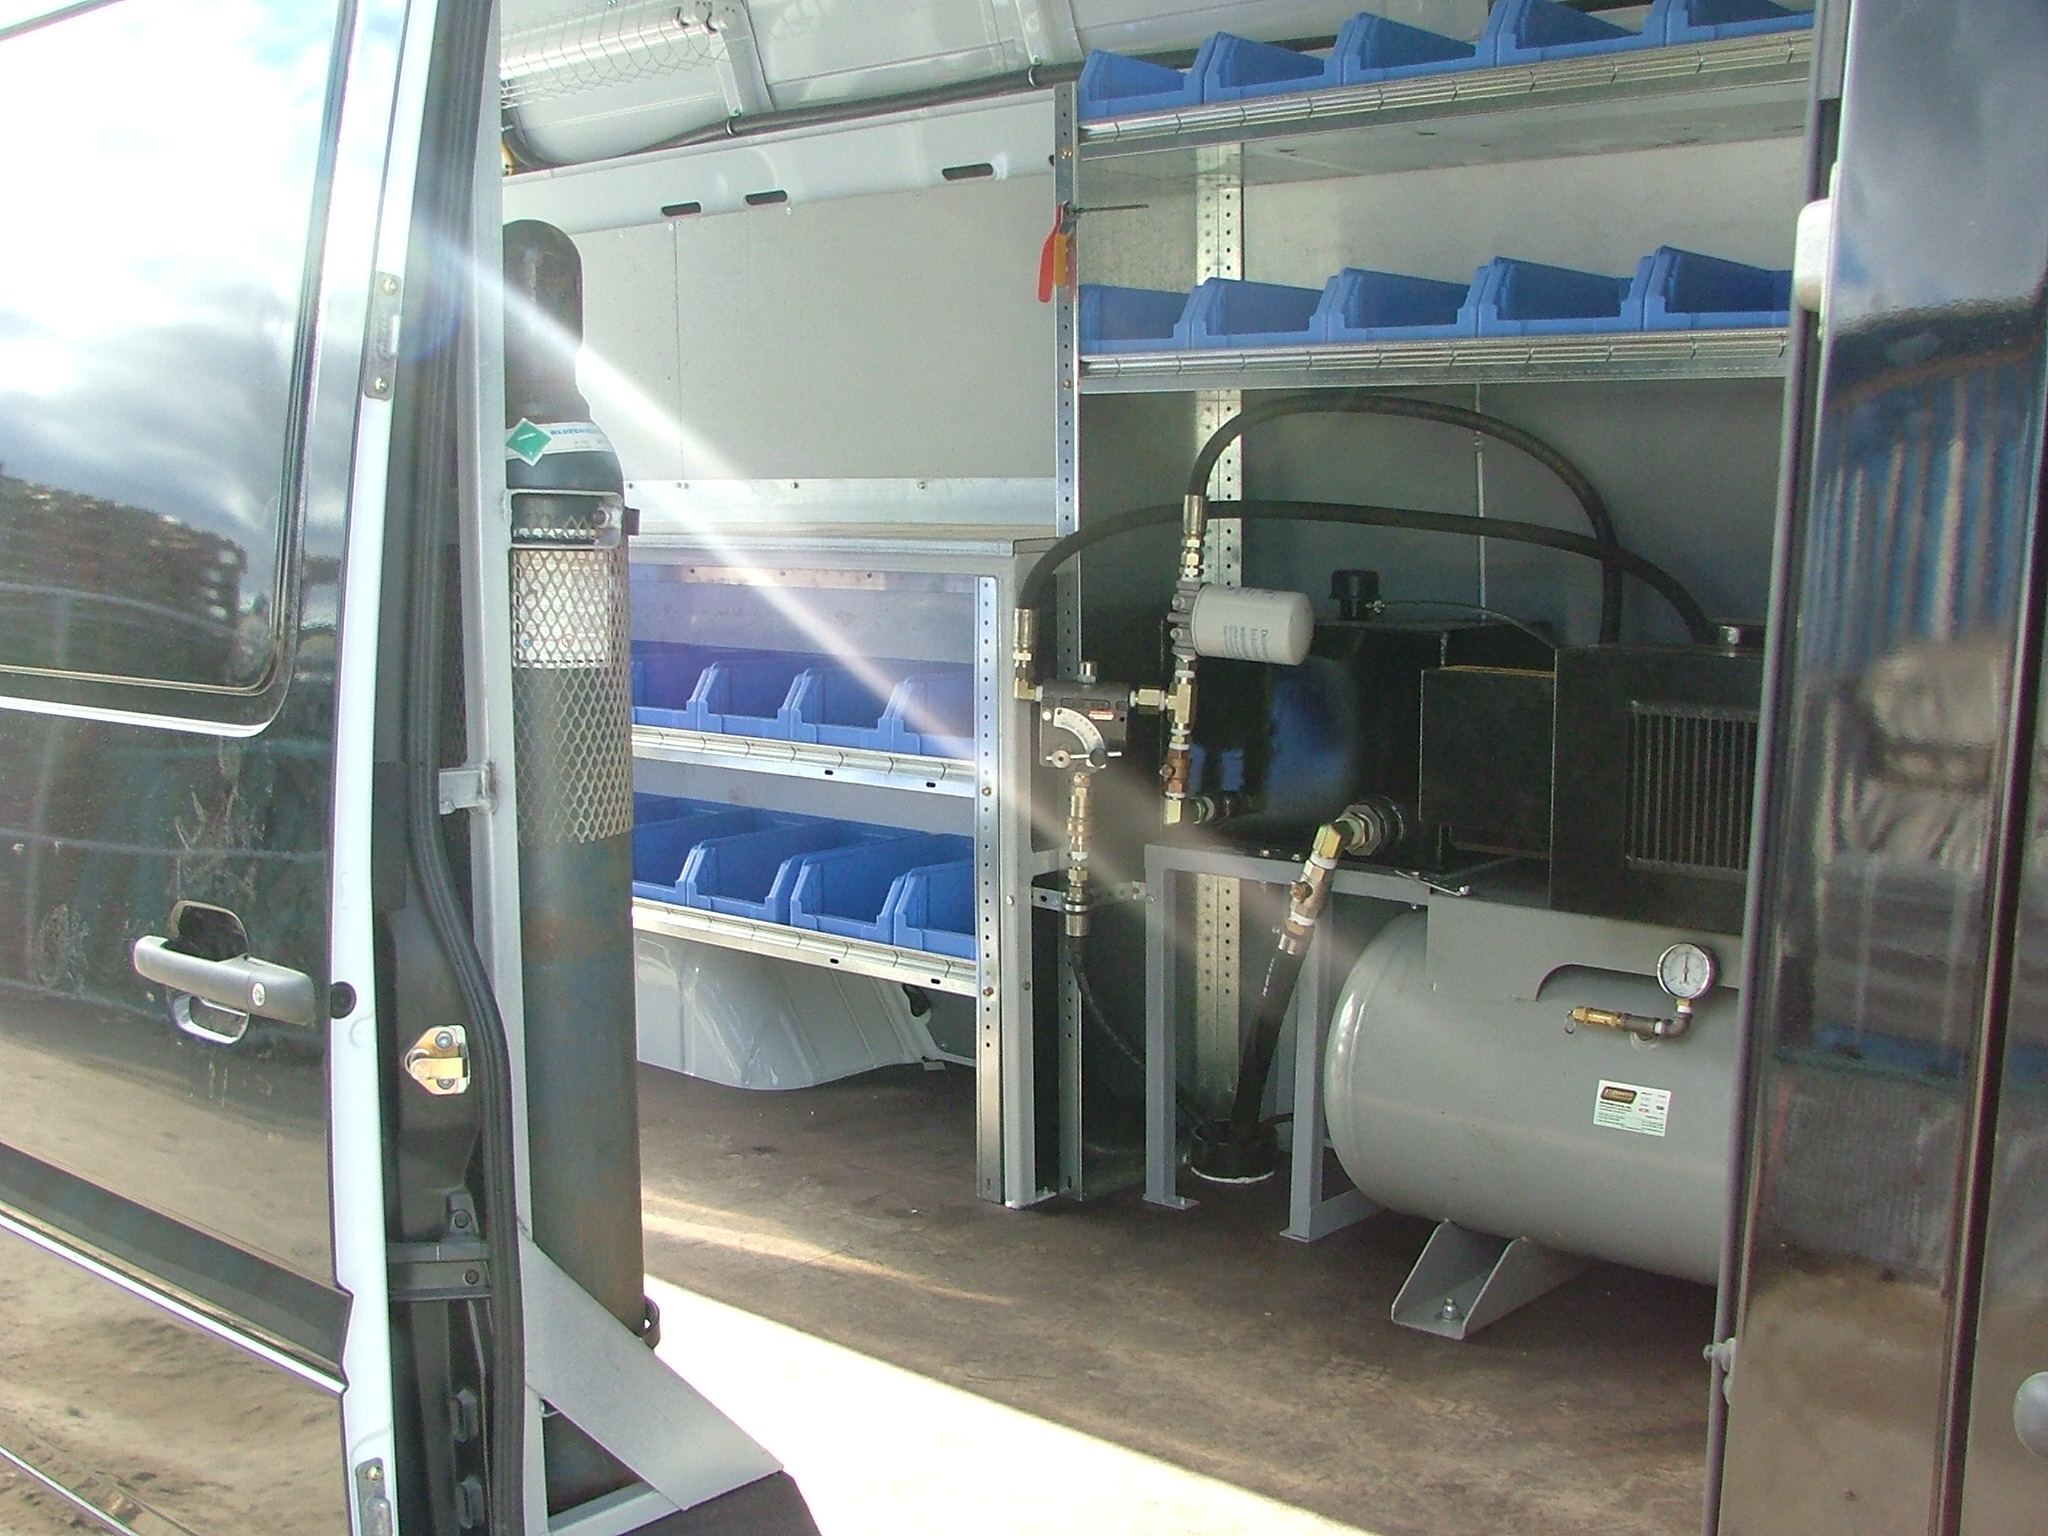 section camion de service. Black Bedroom Furniture Sets. Home Design Ideas